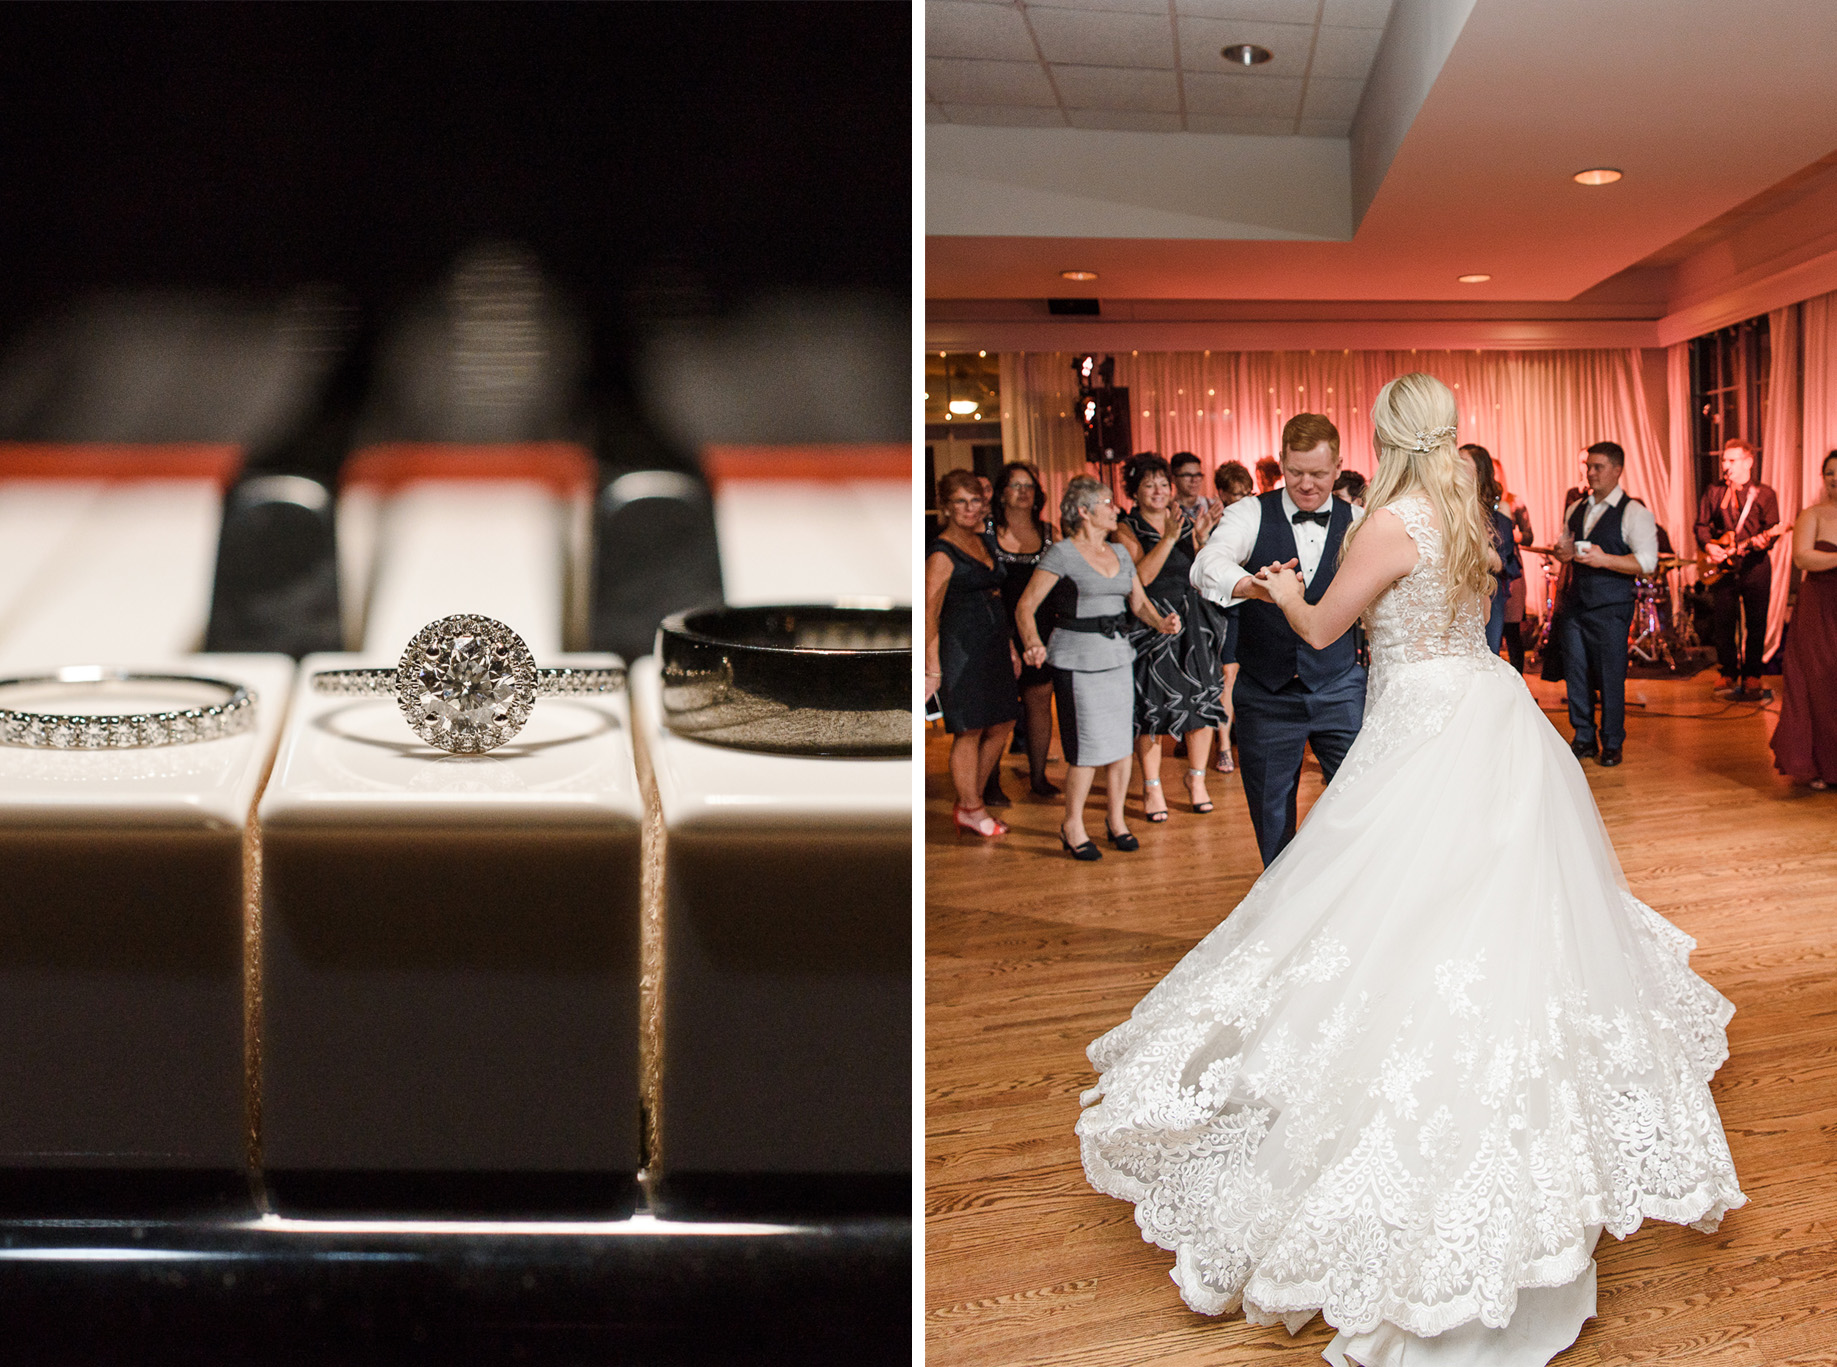 Julie_and_Ben_Wedding_Double_FOR_BLOG_4.jpg